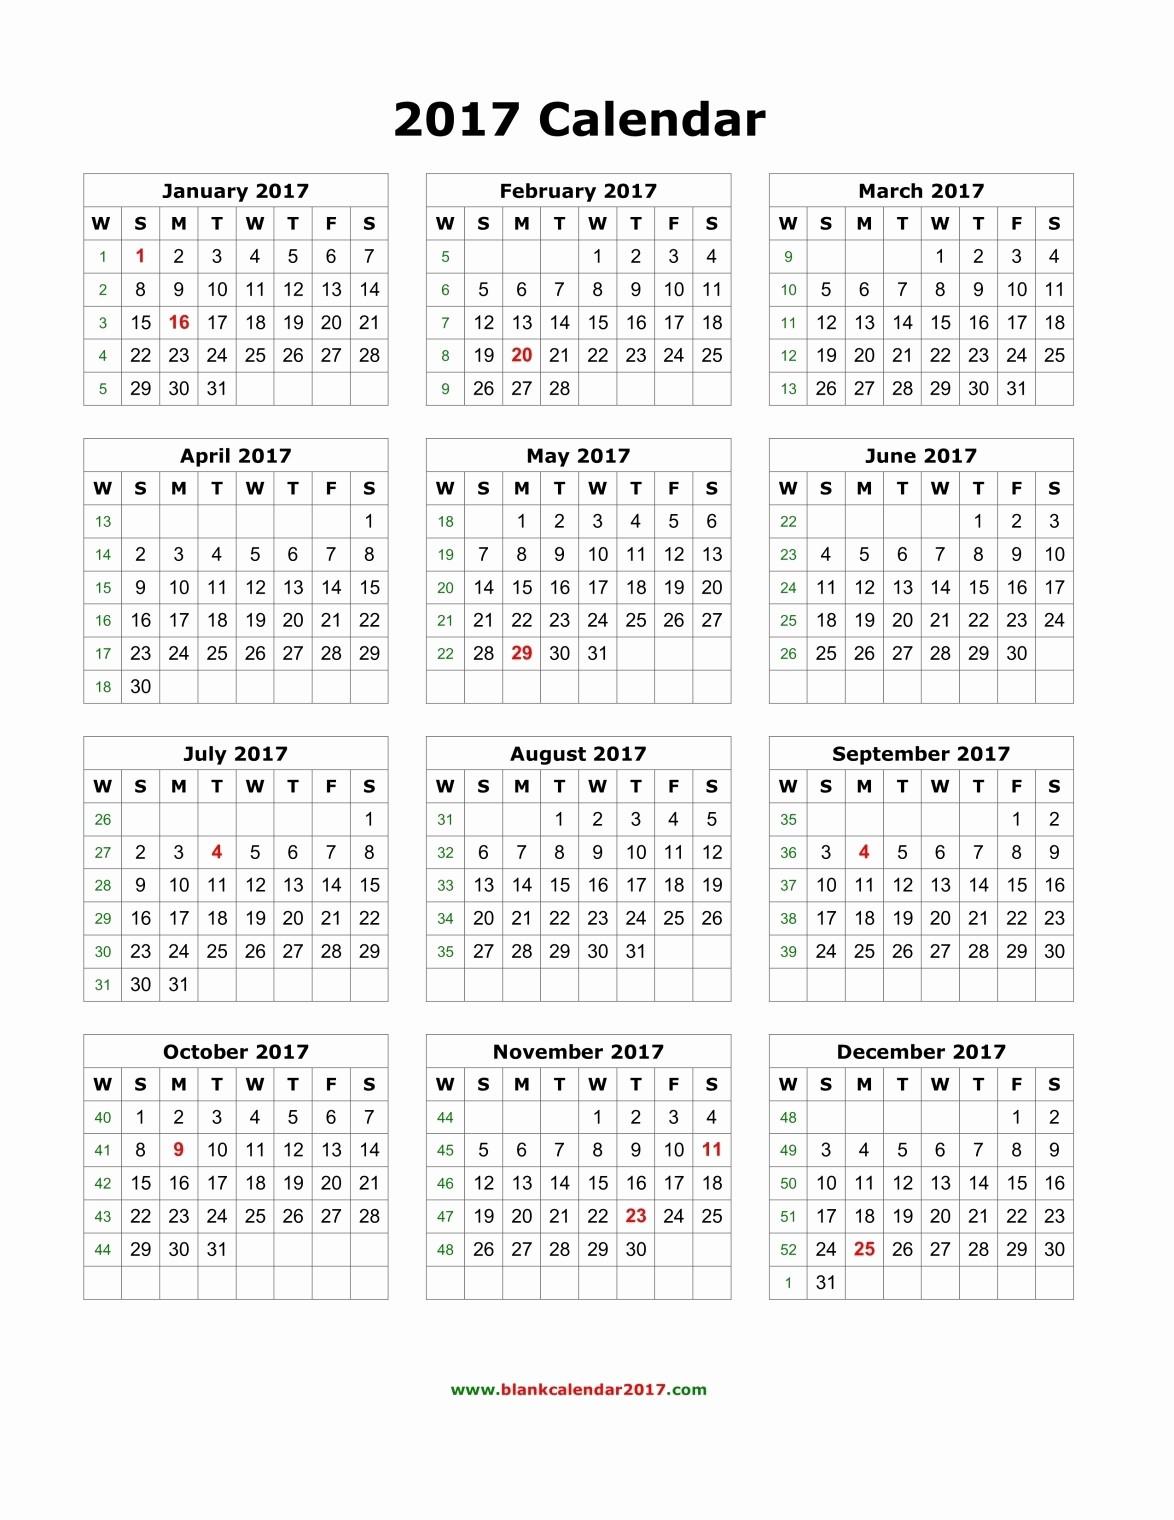 Excel Calendar 2017 with Holidays Fresh April 2017 Calendar Excel